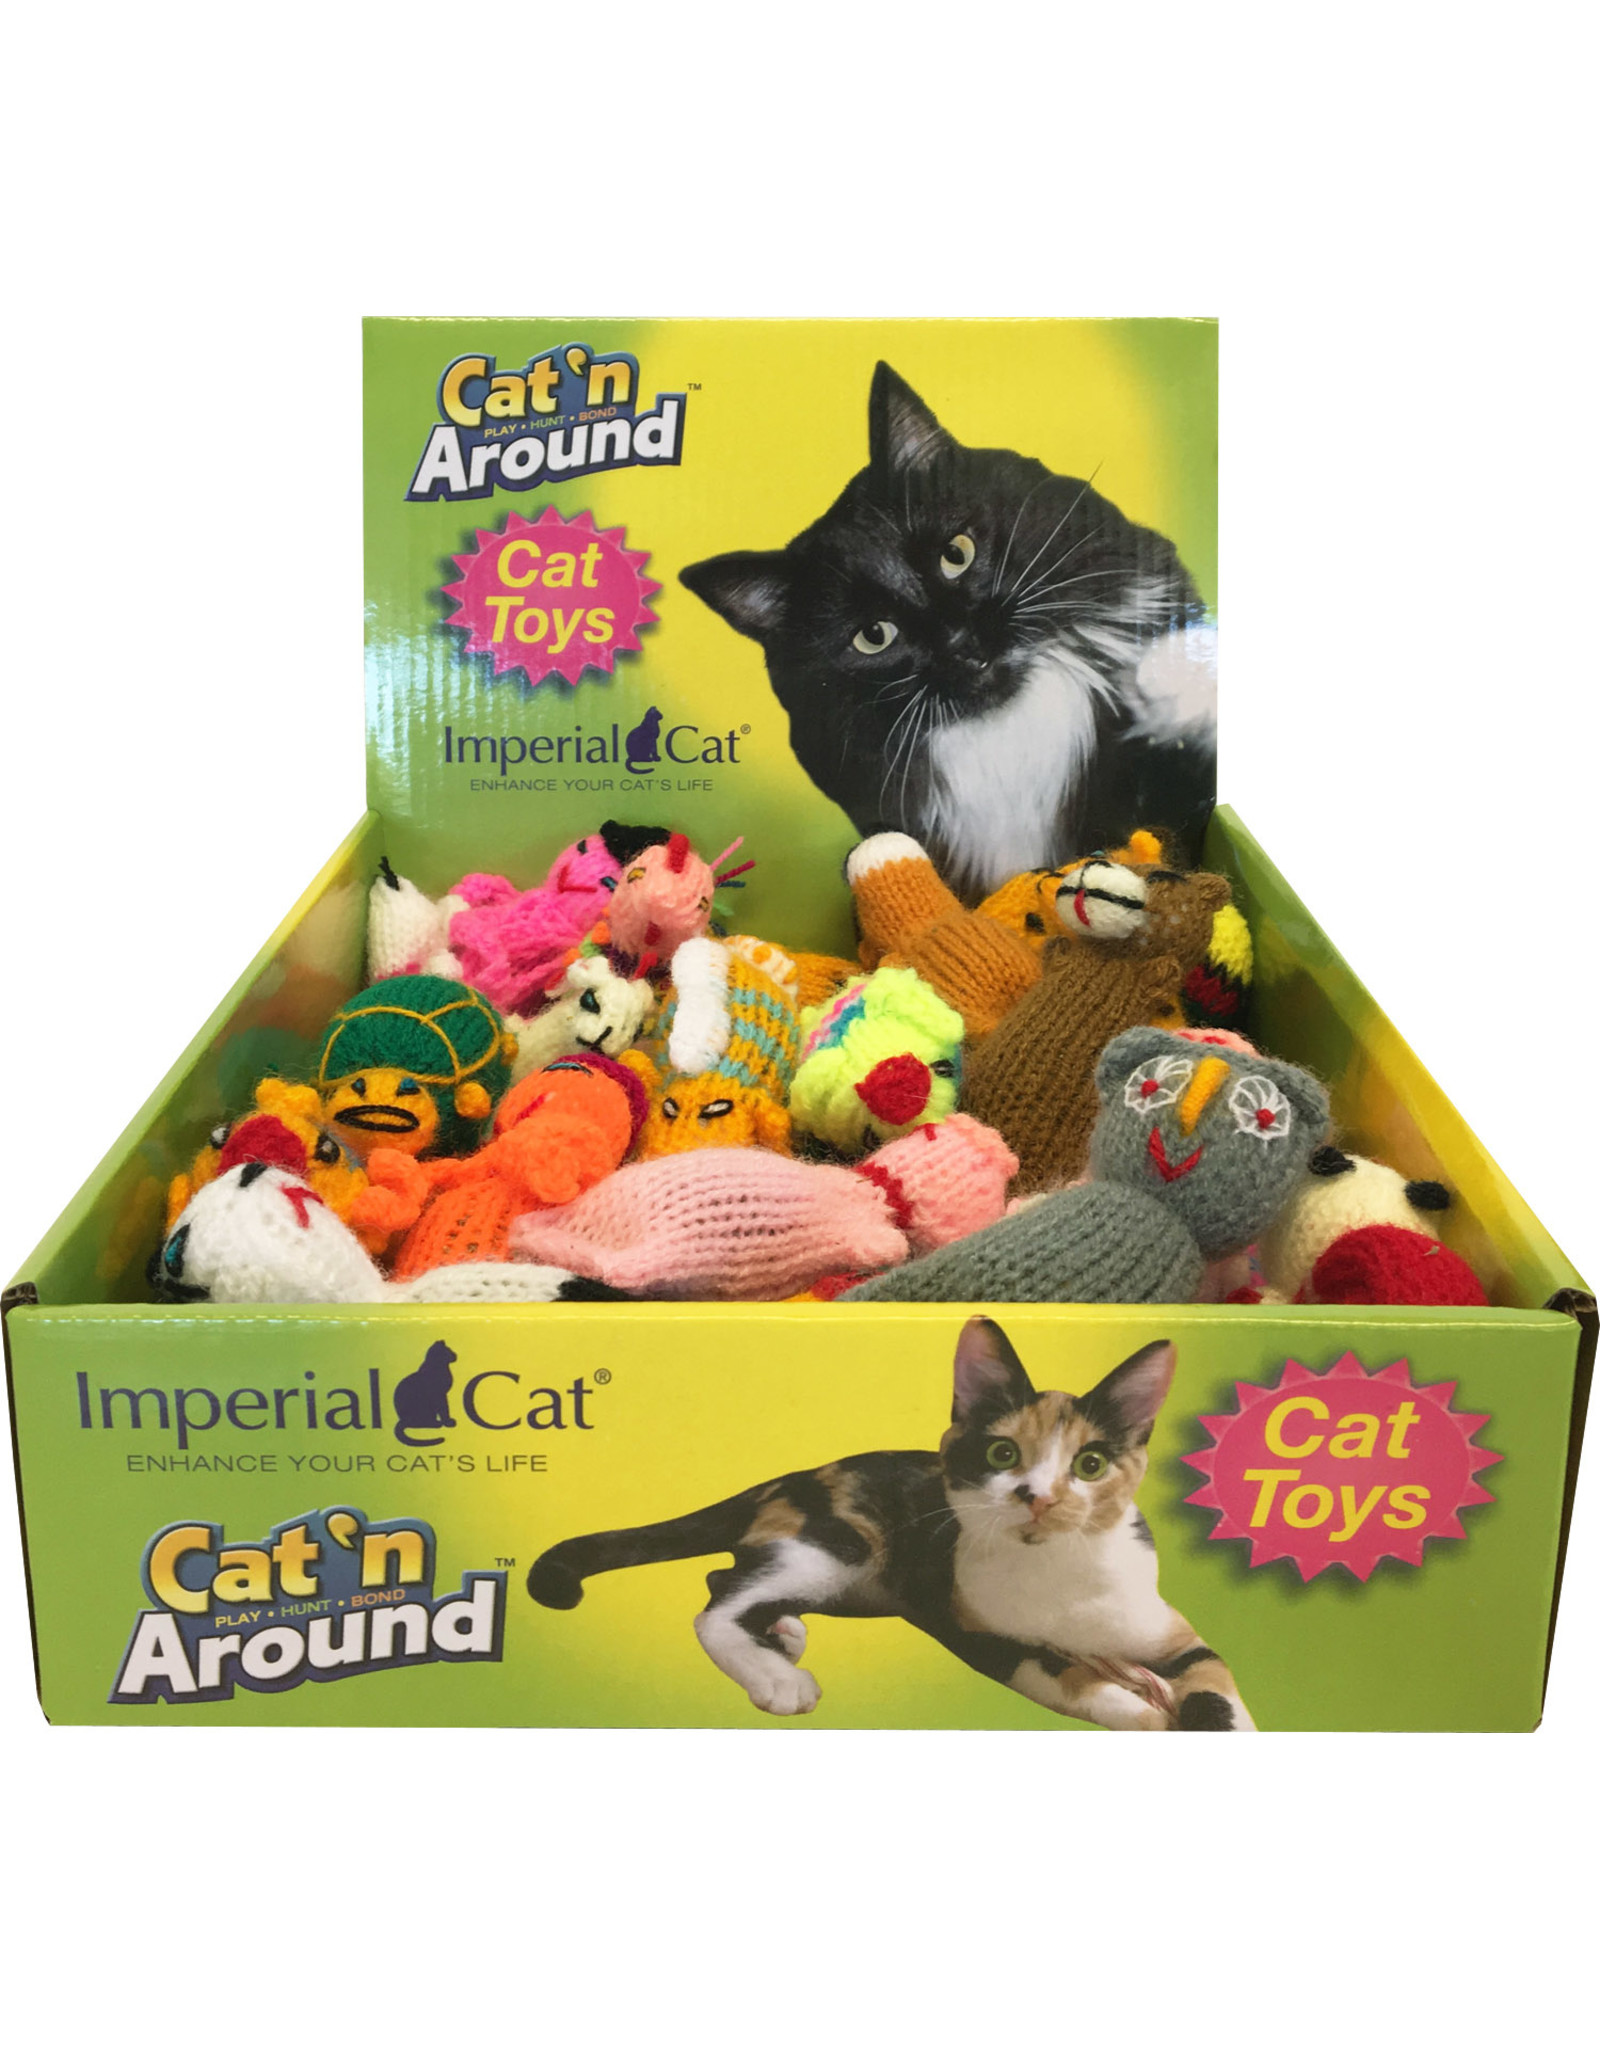 Imperial Cat Imperial Cat Catnip Critters